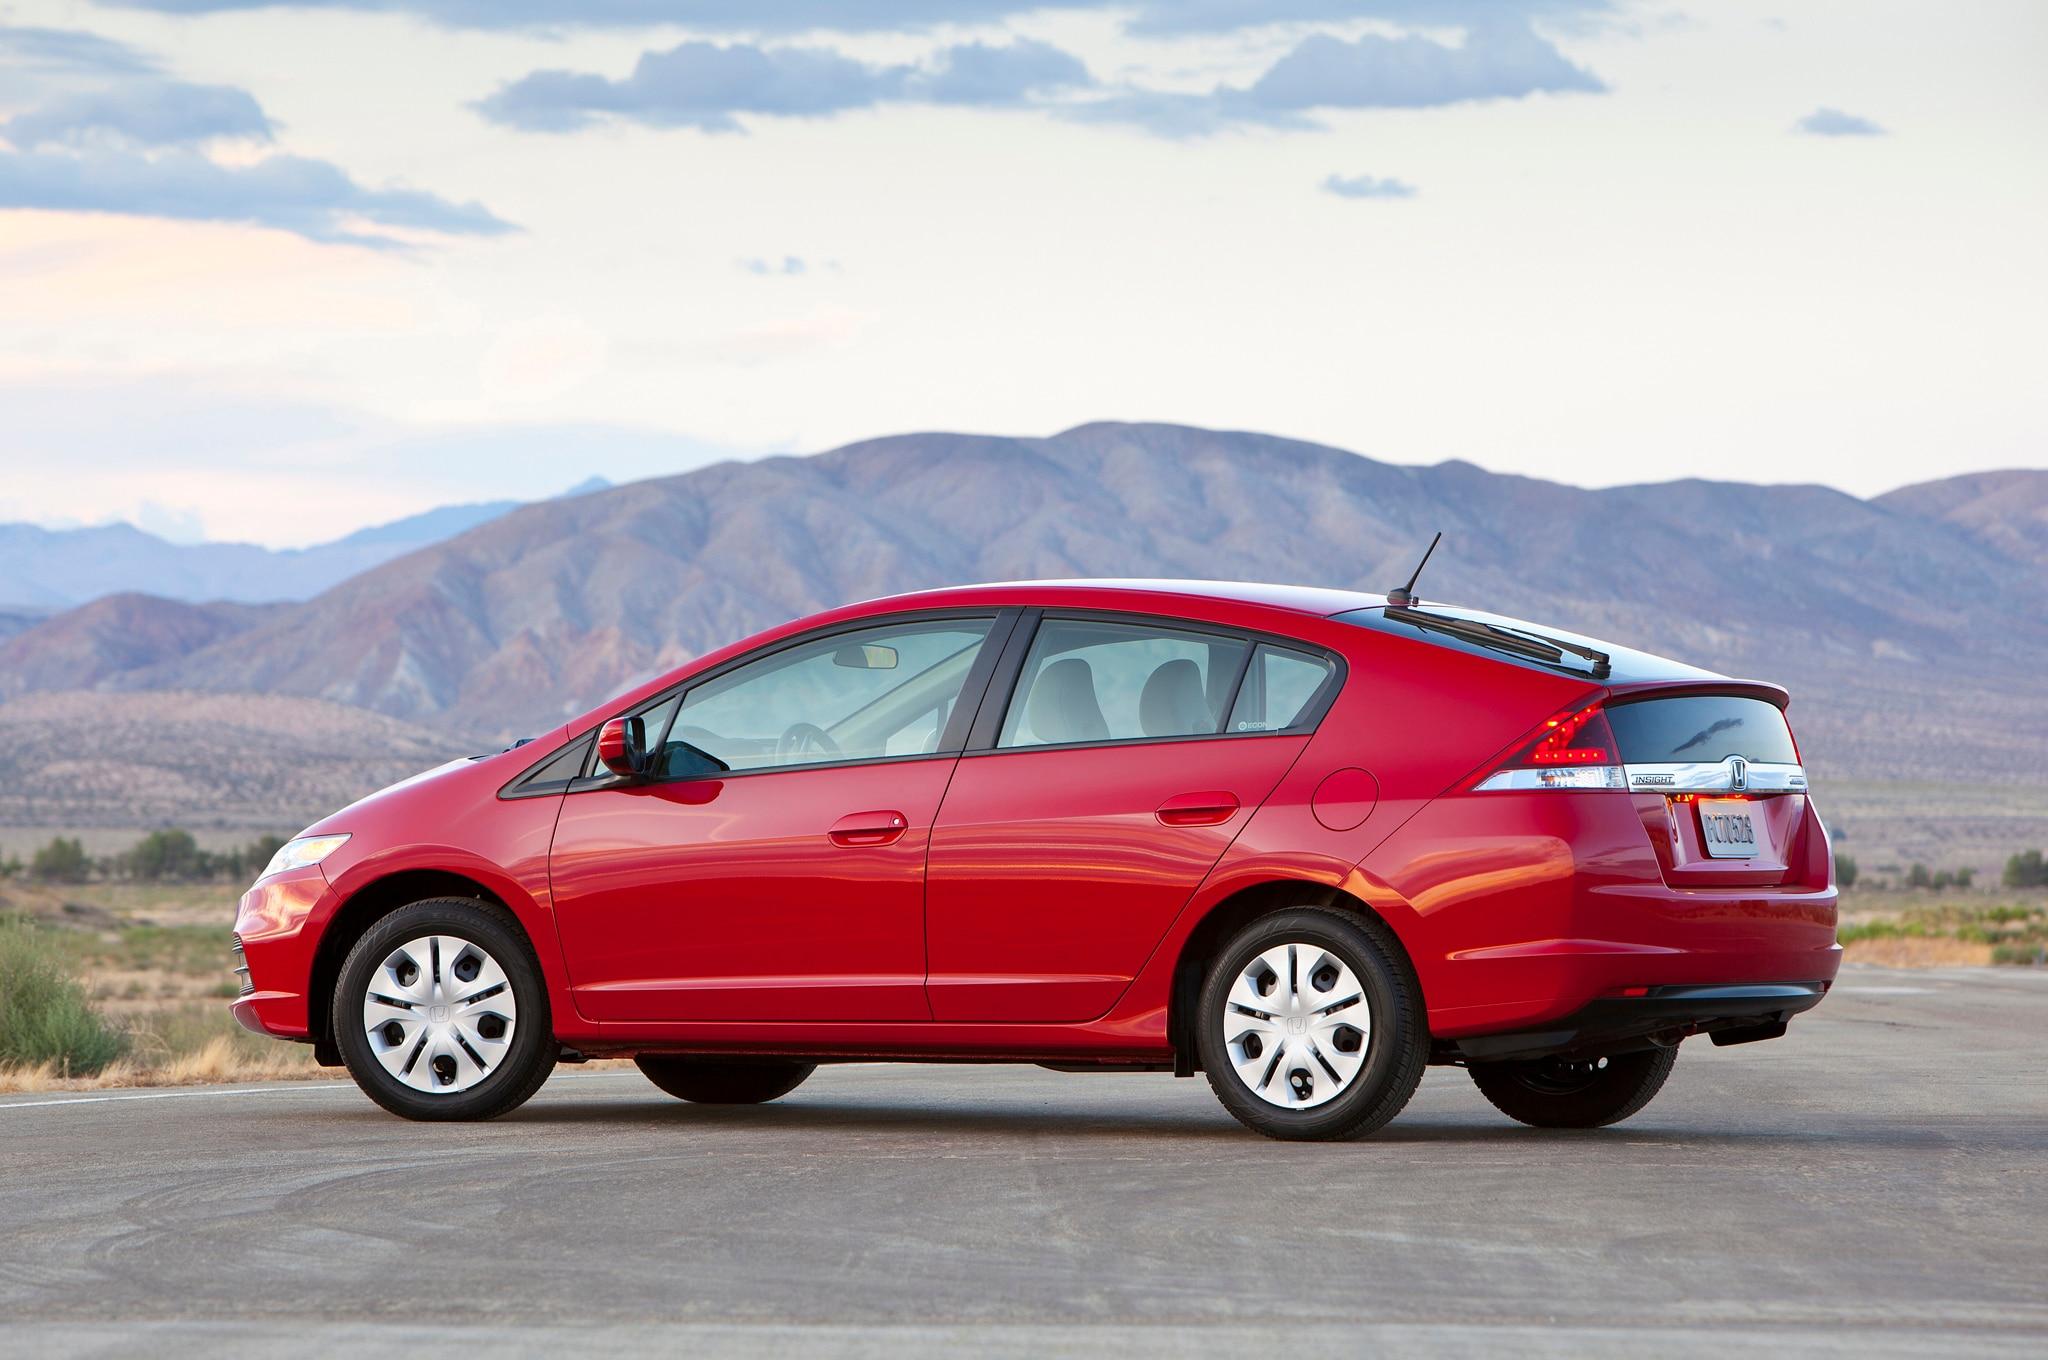 2014 Honda Insight Priced at $19,515